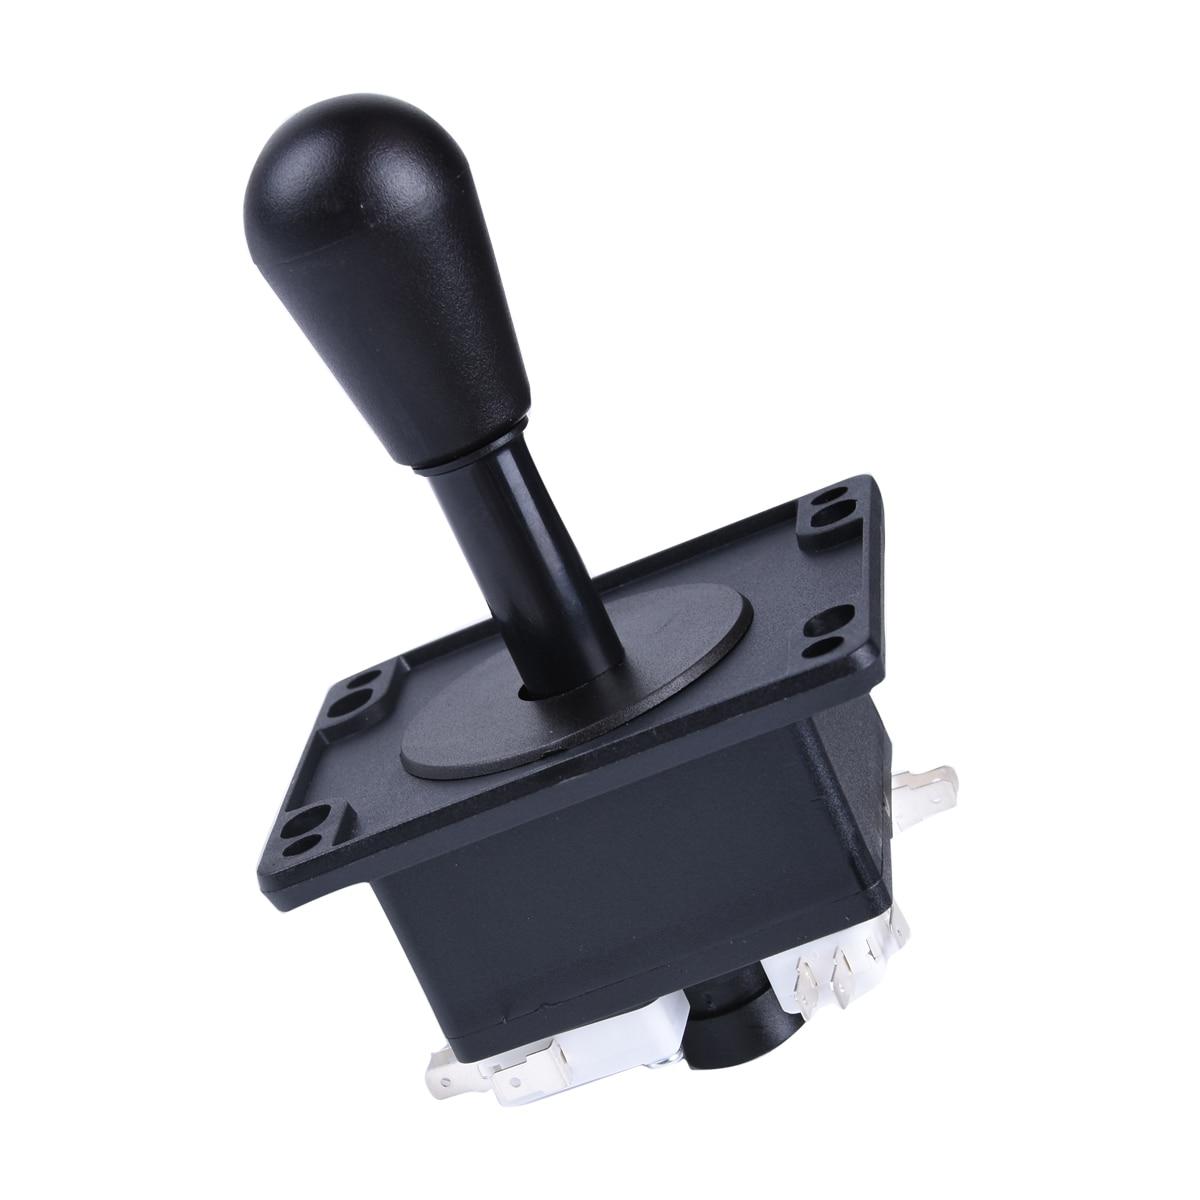 New Competition 4 Way 8 Way American HAPP NEOGEO Joystick Arcade Jamma Mame with Microswitch Controller Black Stick